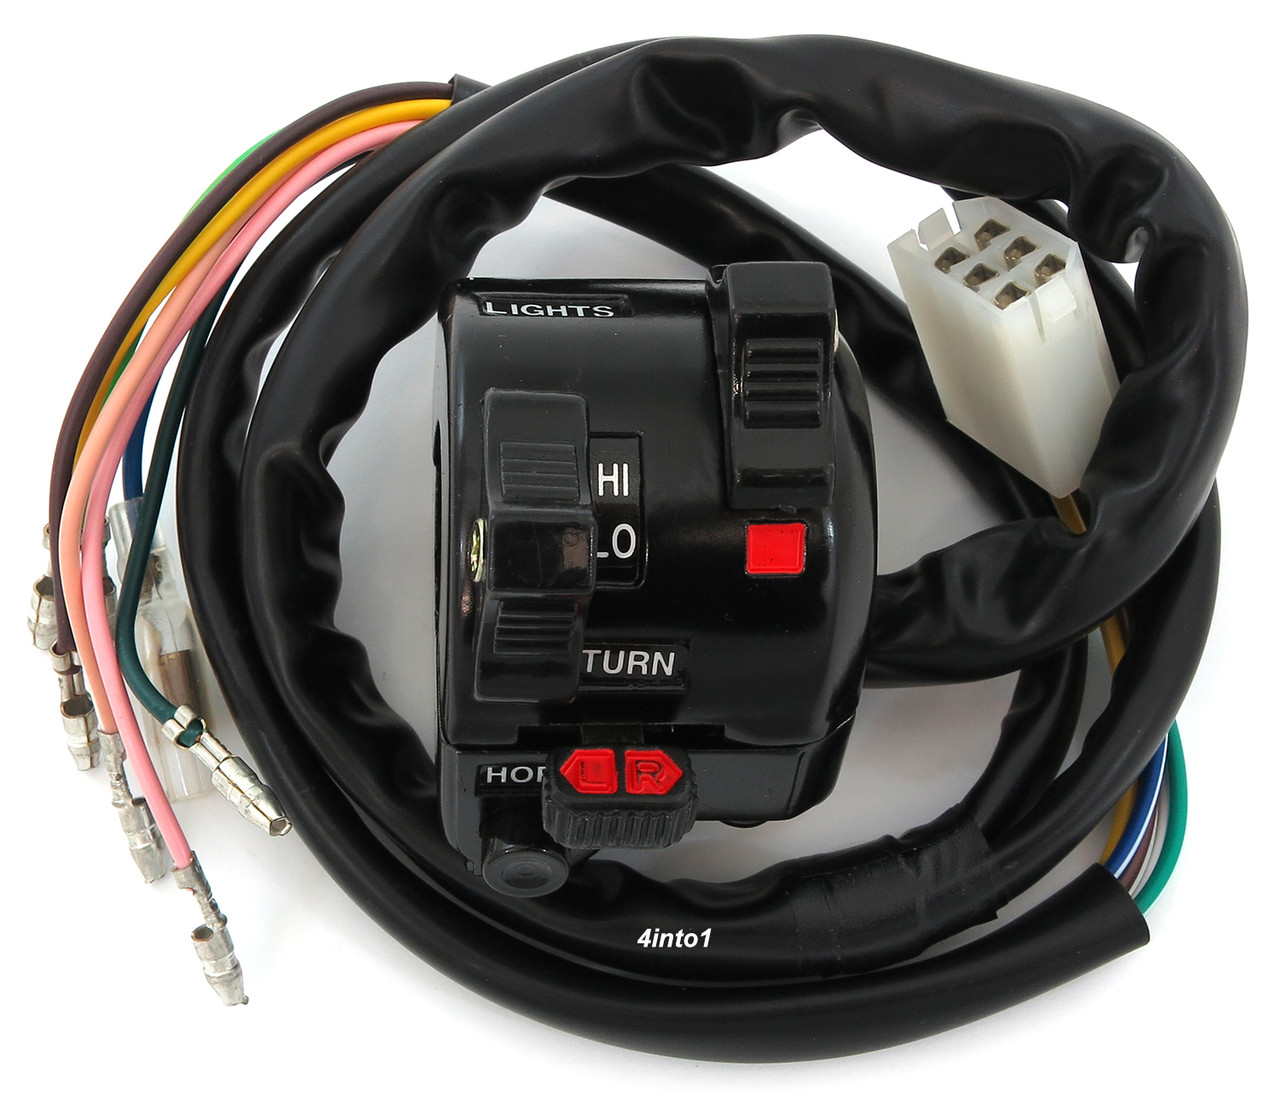 Single Shock Rear Brake Light Switch for 1978 Yamaha DT 125 E